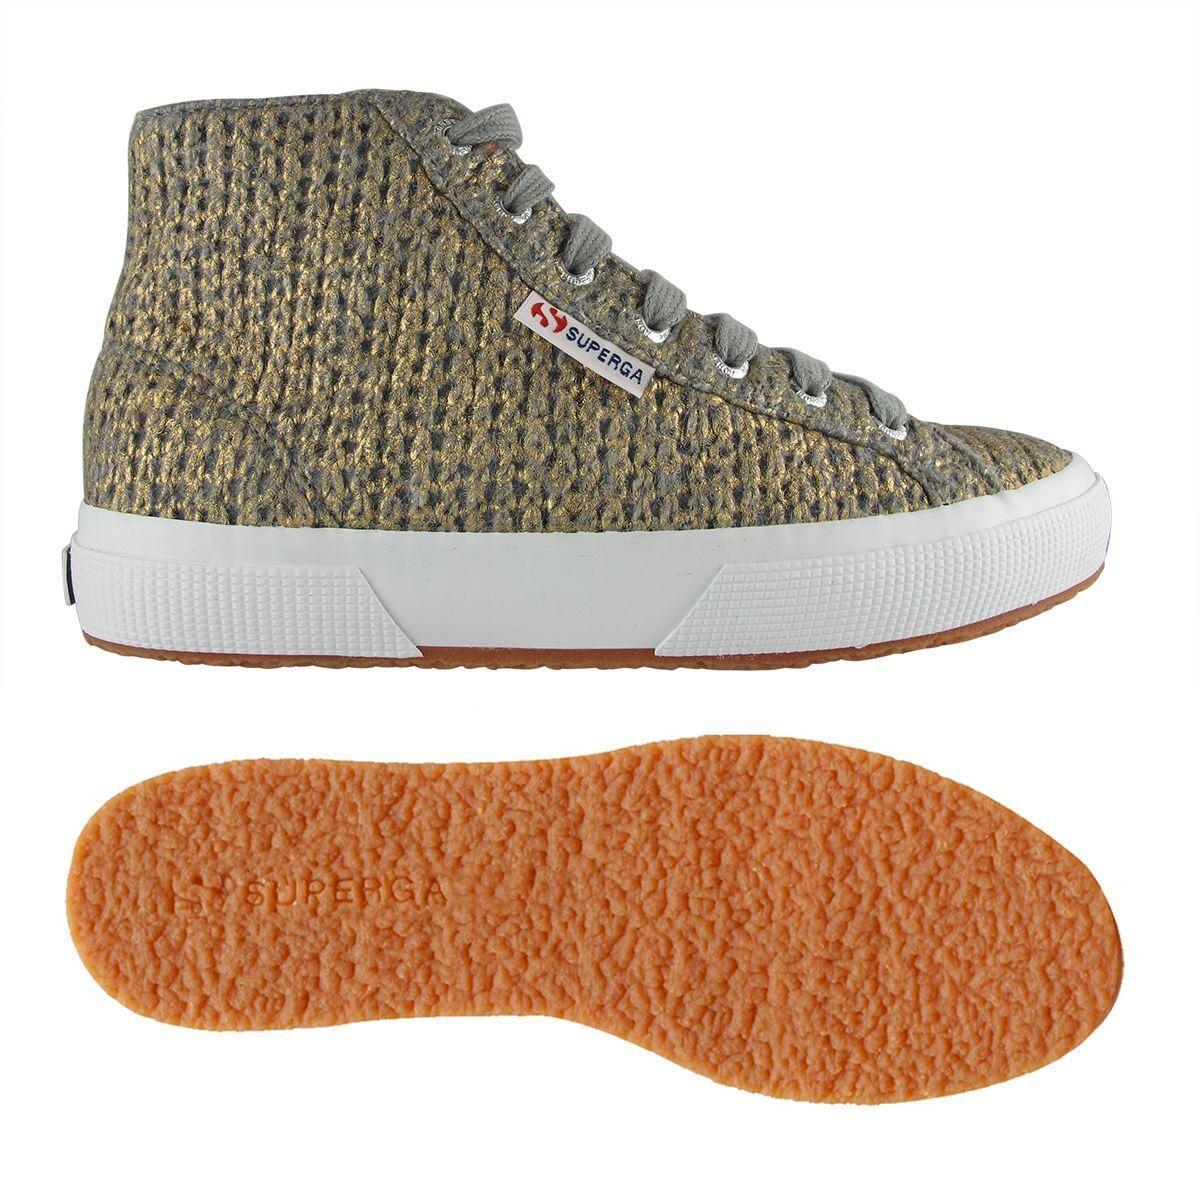 SUPERGA 2795-WOOLMETW - Art.S00A5M0 927- COL.Grau-Gold - Sneakers Woman